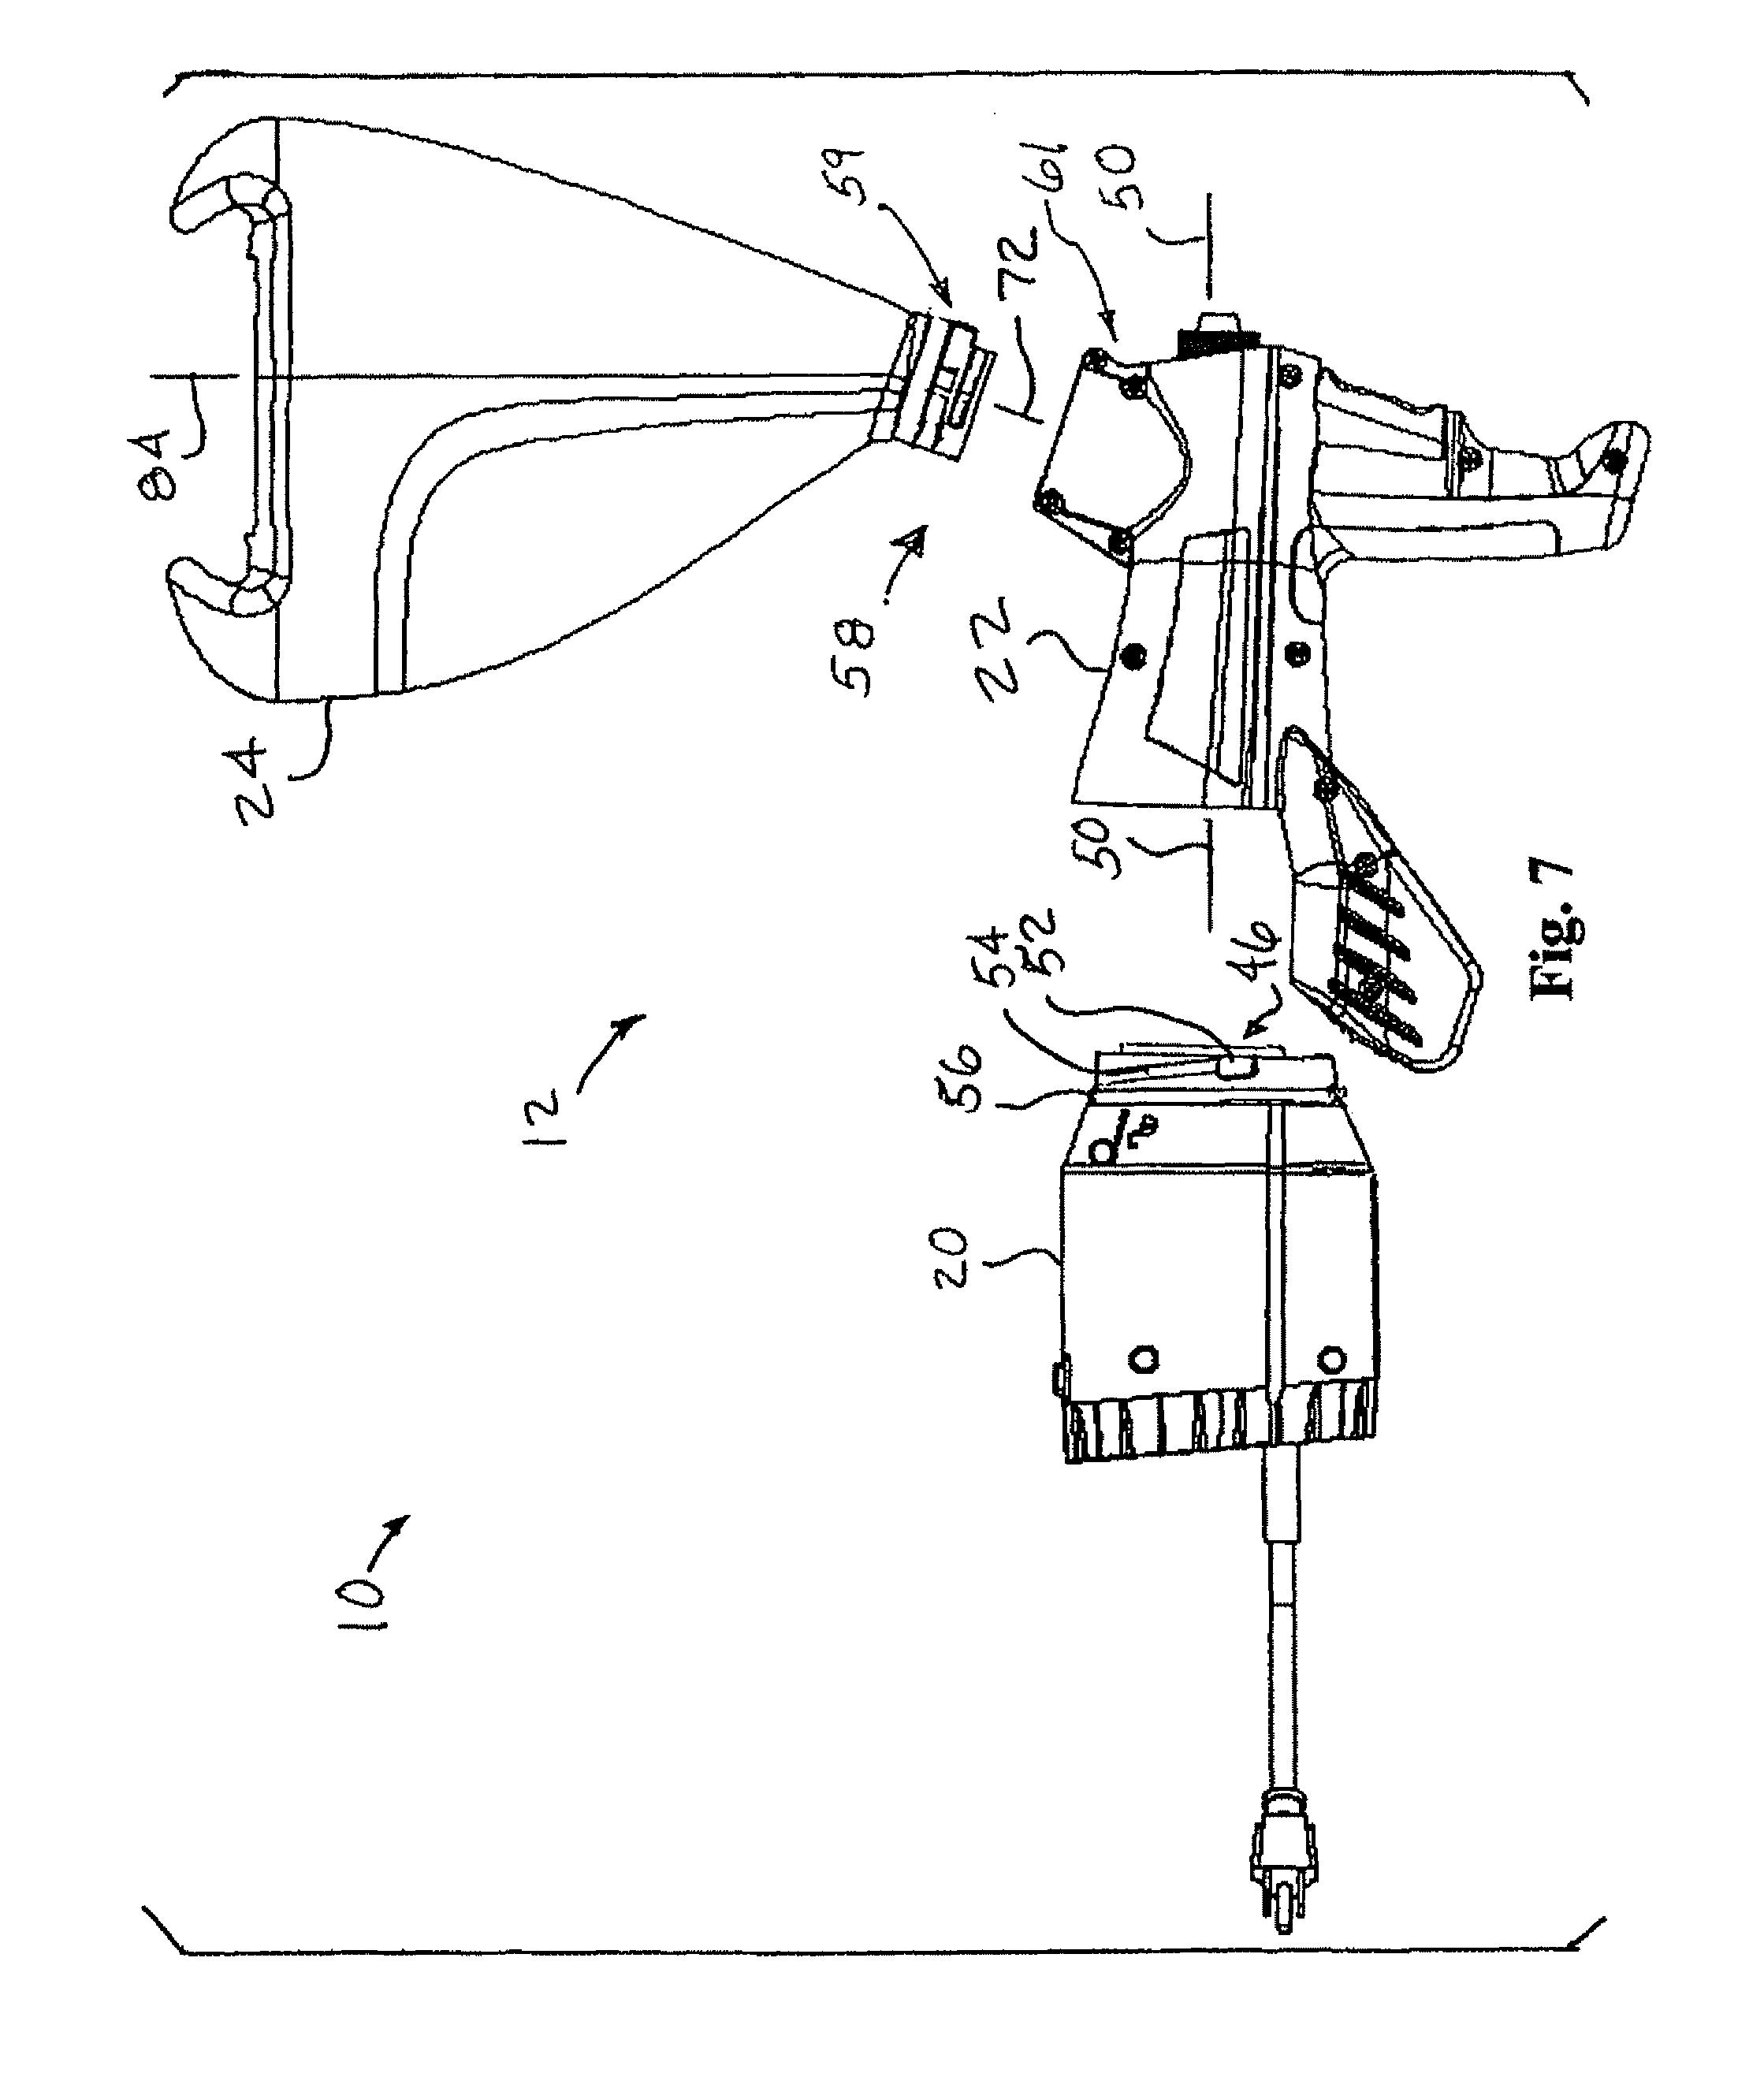 goldblatt texture machine parts